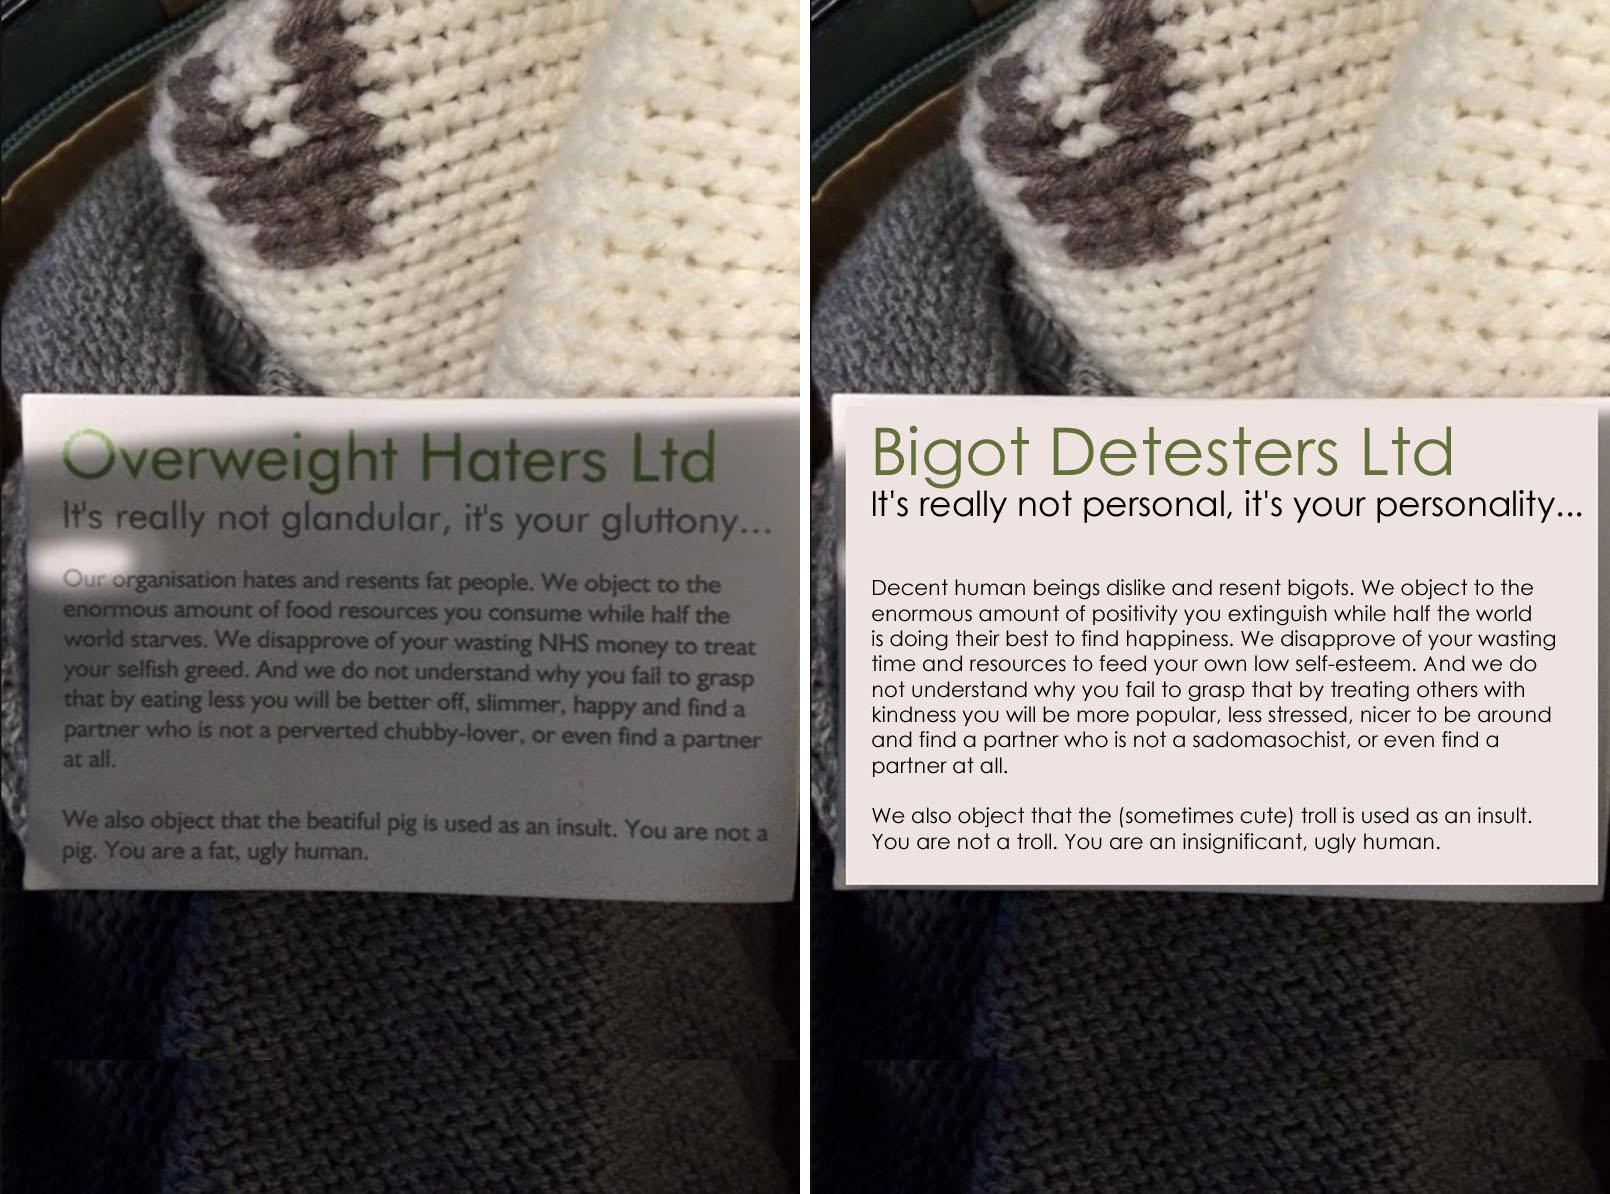 RT @notlamb: Overweight Haters Ltd, meet Bigot Detesters Ltd. I make the *best* introductions. #OverweightHatersLtd https://t.co/wk6JOV4LWG